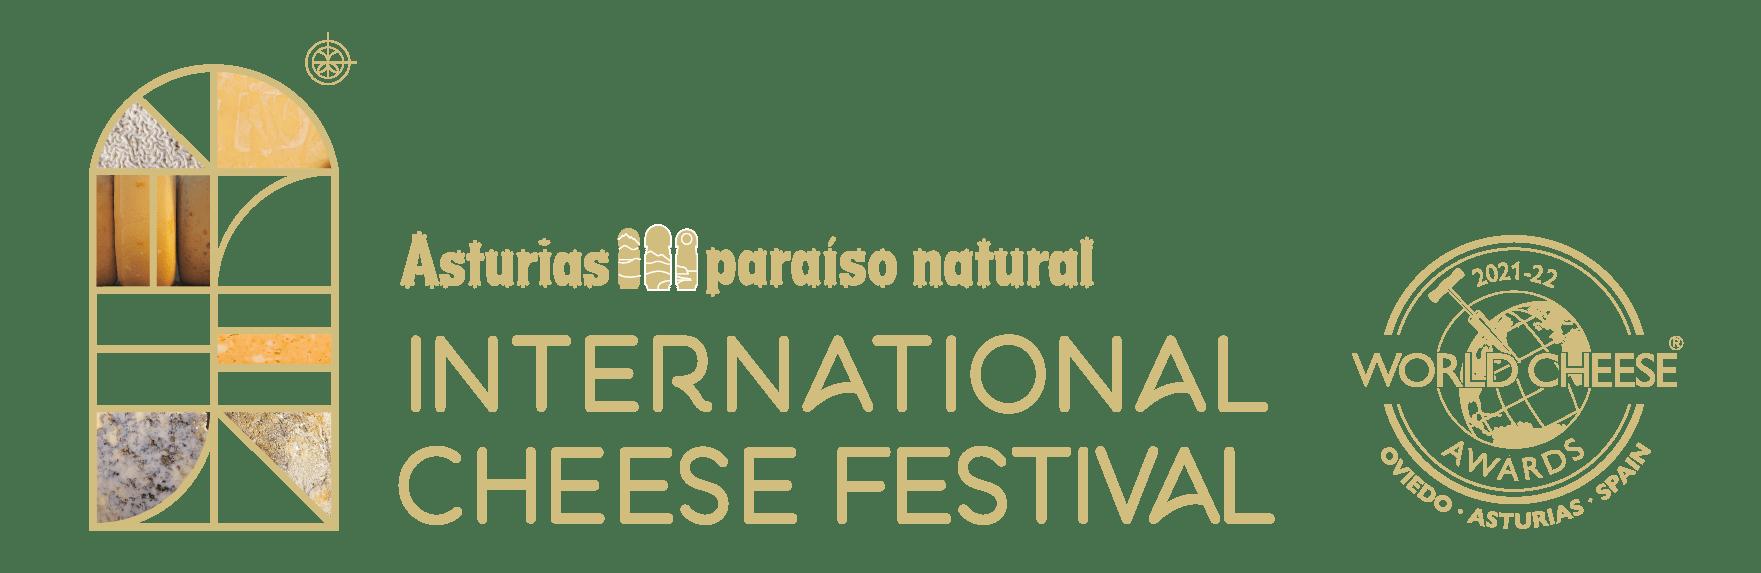 Asturias Paraíso Natural International Cheese Festival